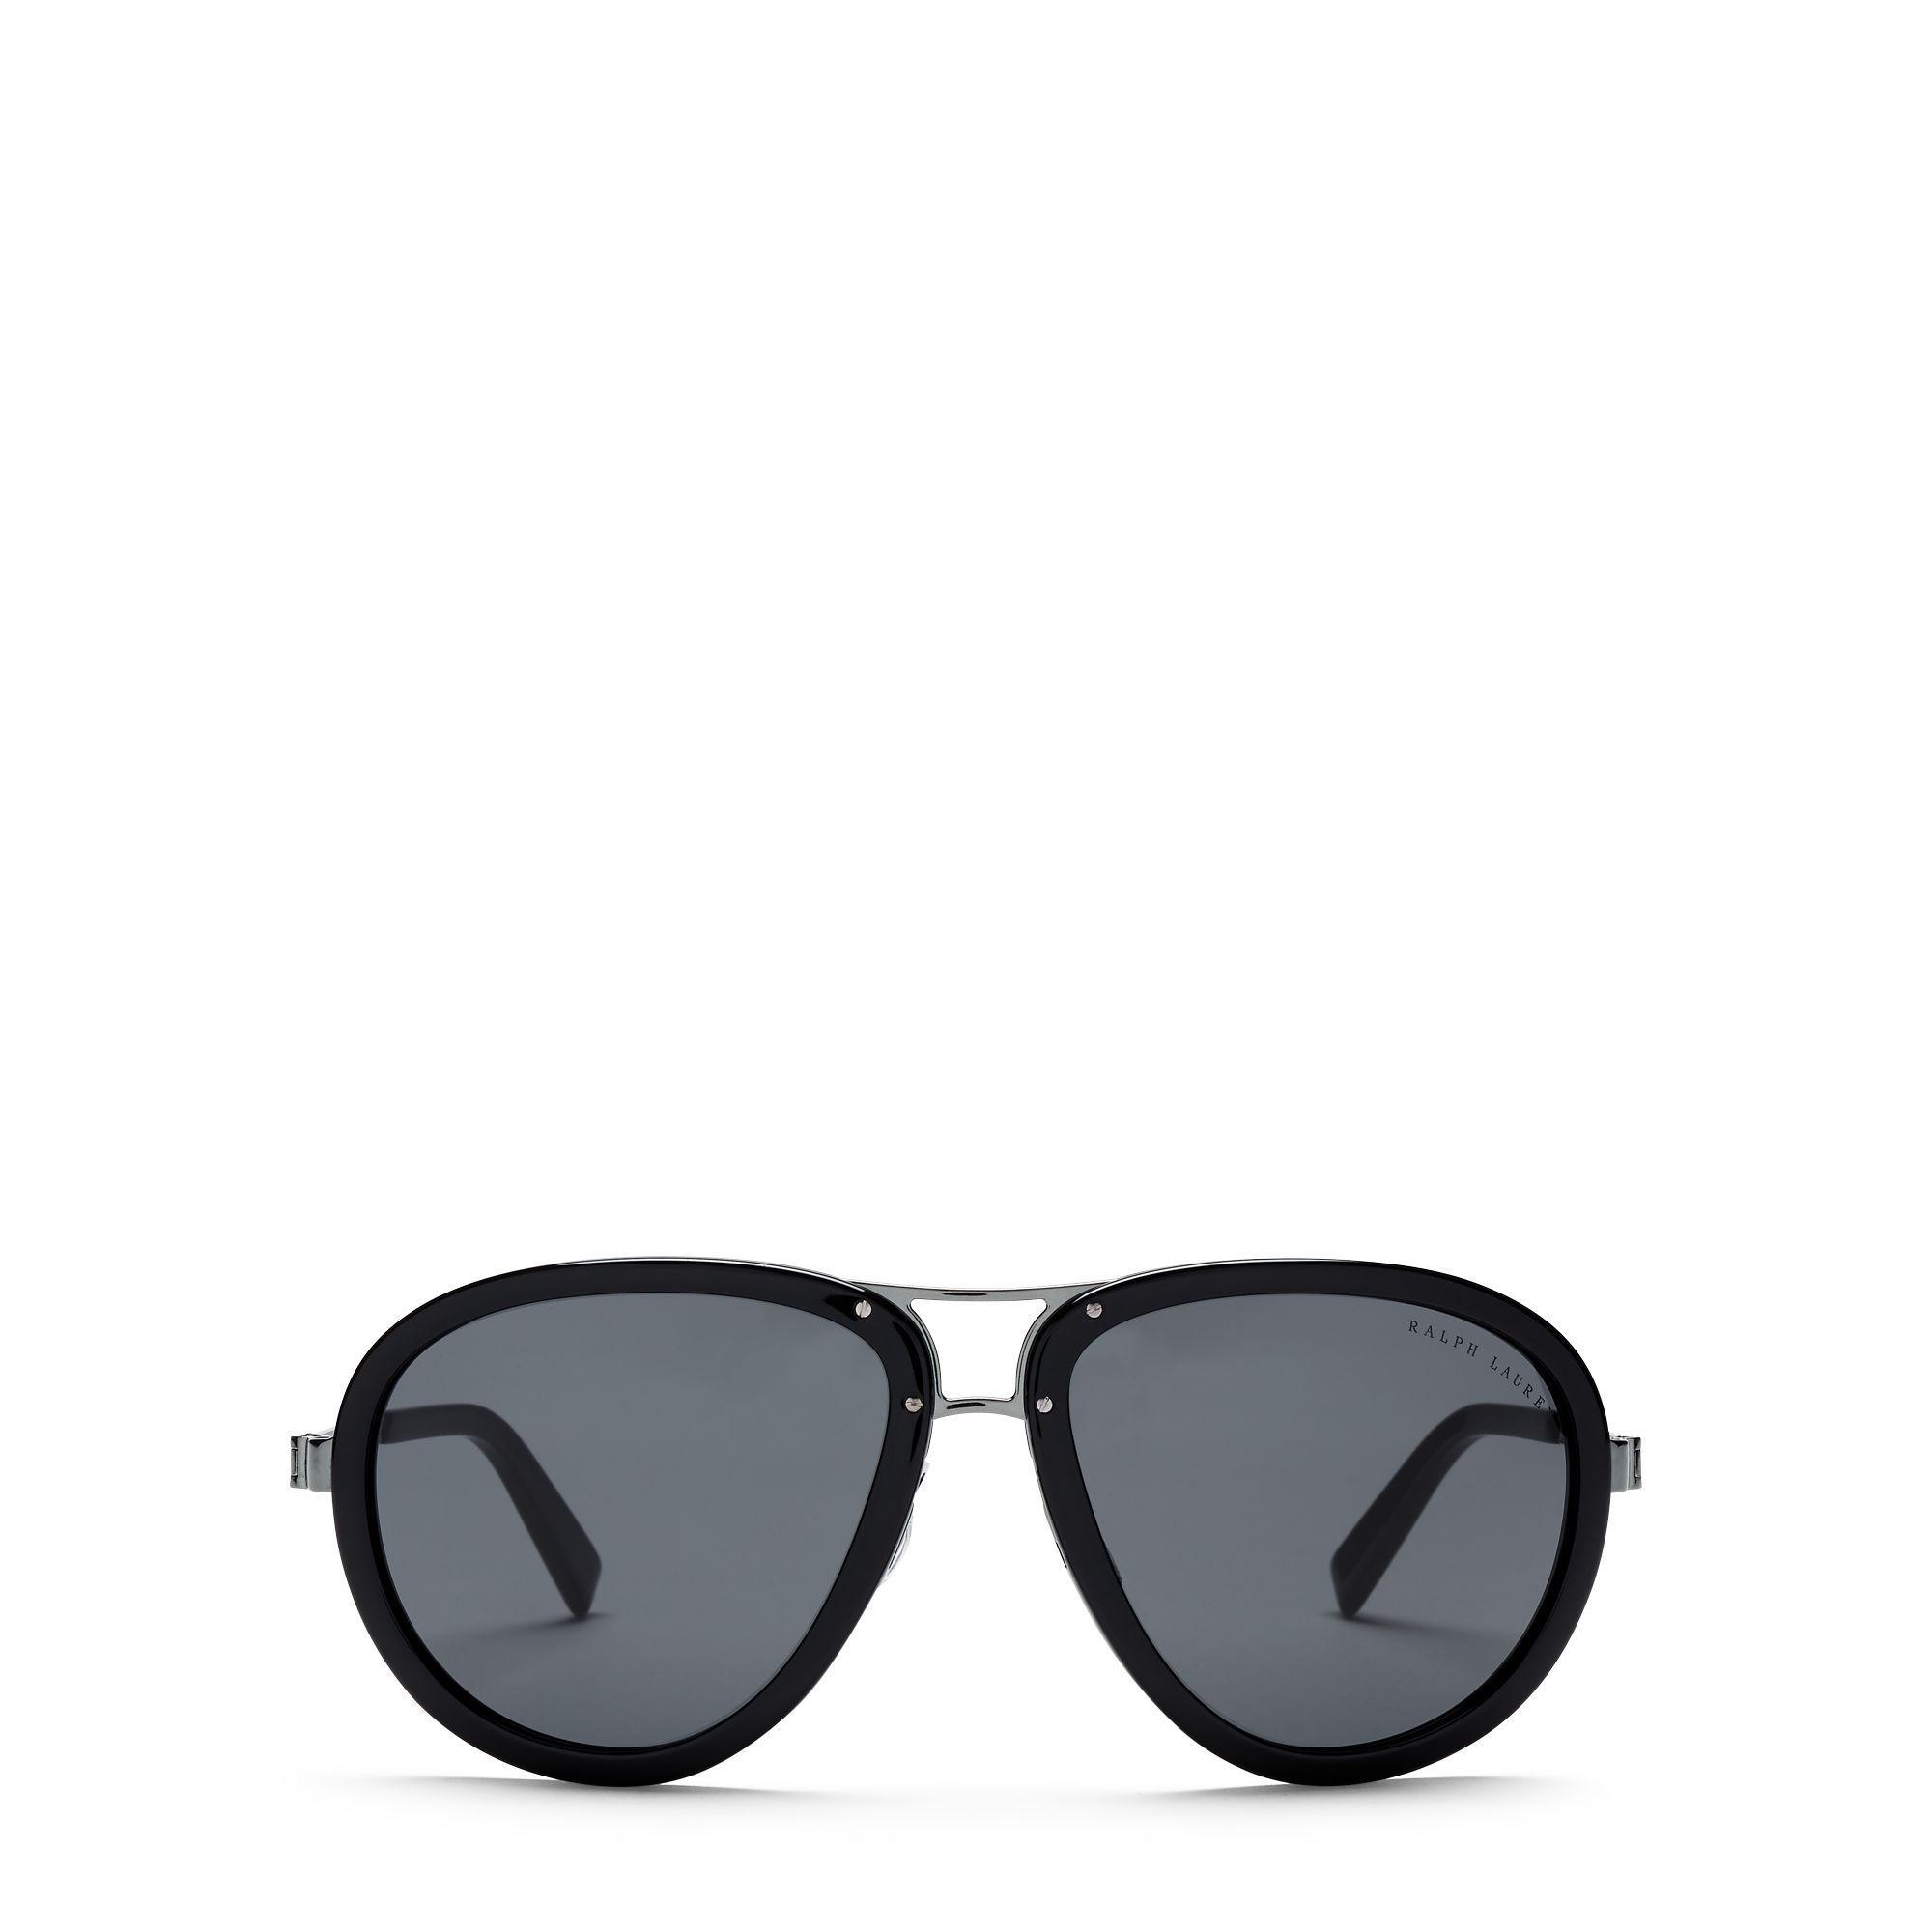 lyst polo ralph lauren piloten sonnenbrille automotive in black. Black Bedroom Furniture Sets. Home Design Ideas